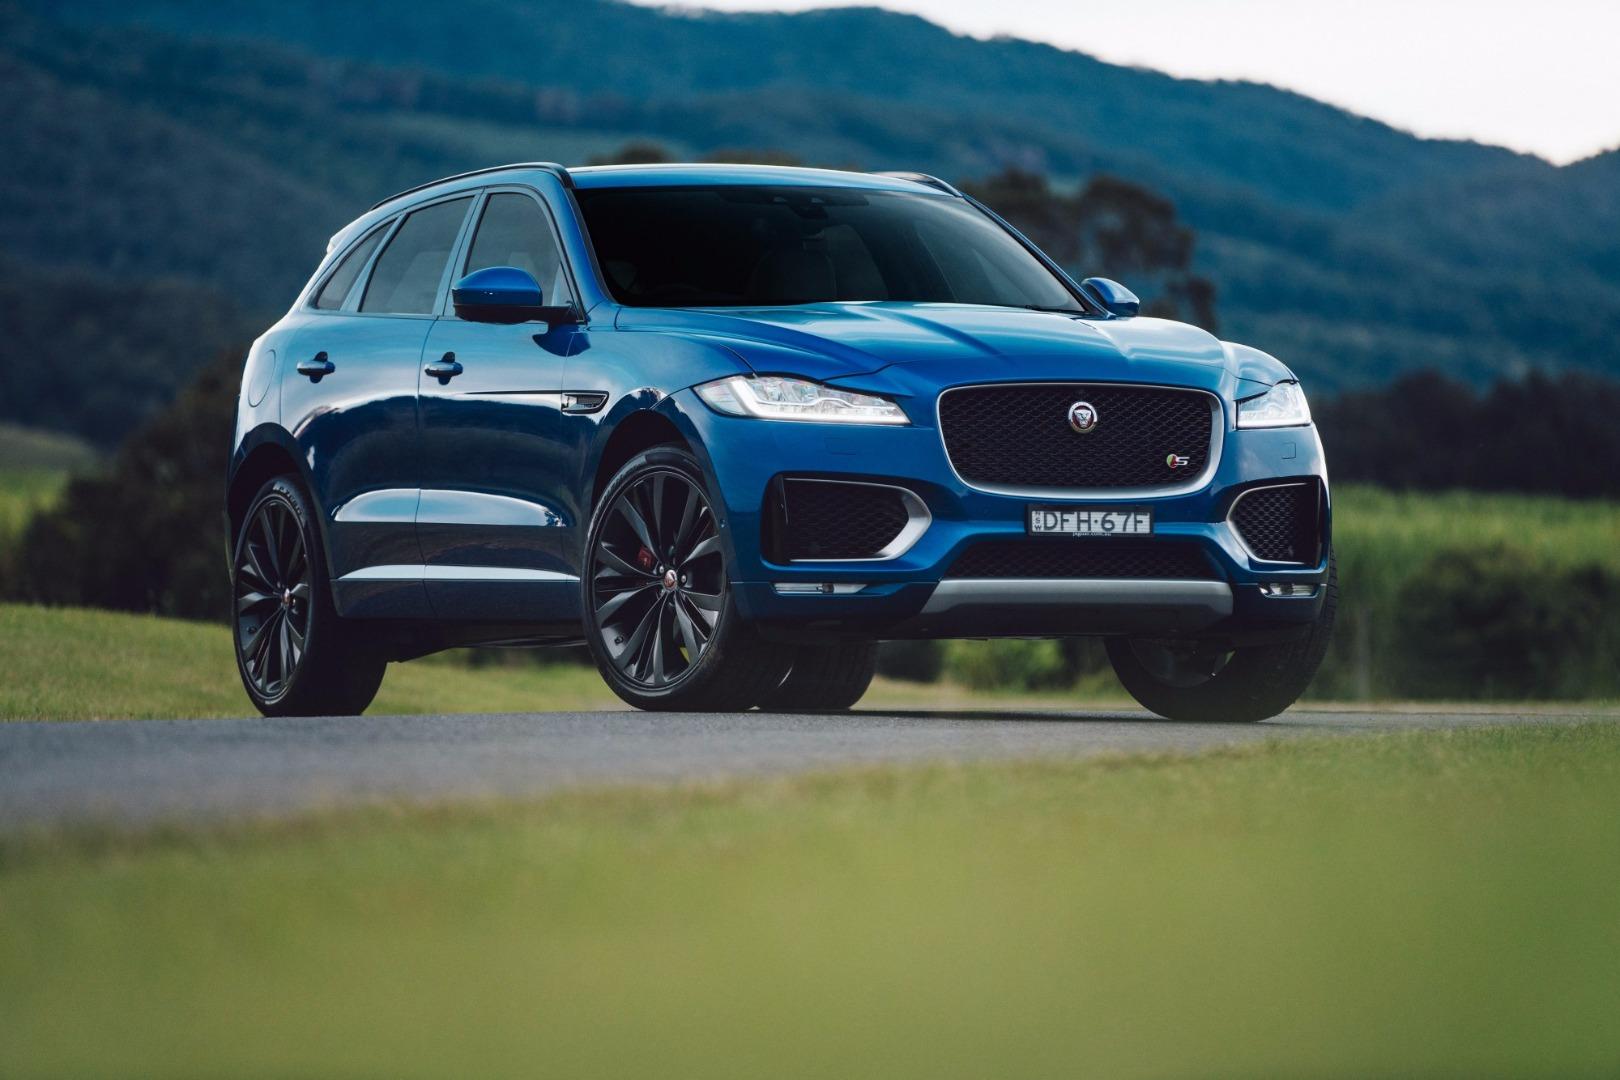 News - Jaguar F-Pace Arrives In Australia Starting At $74,340